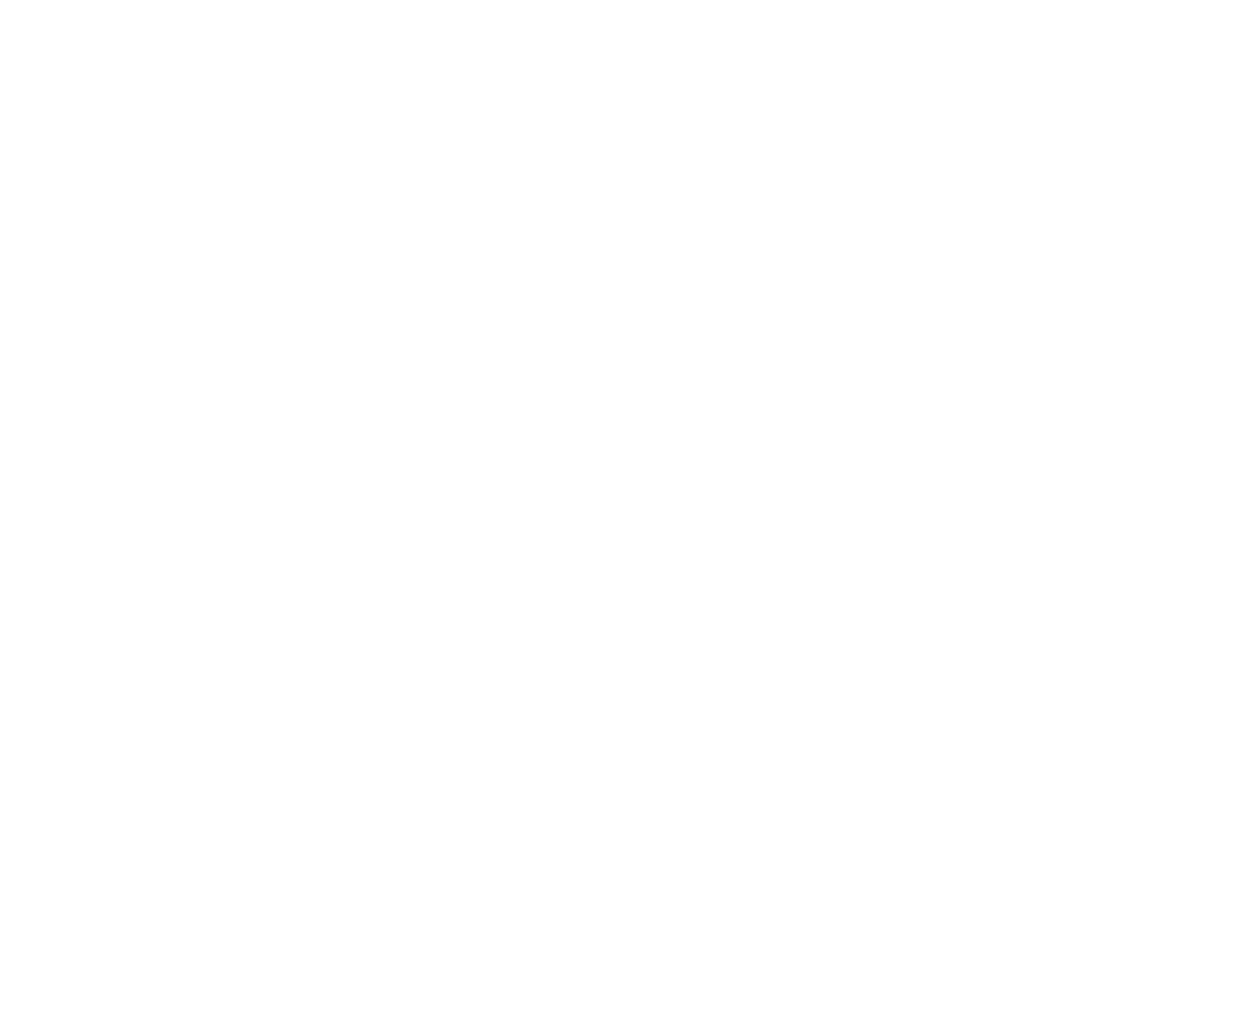 Veegmachine1